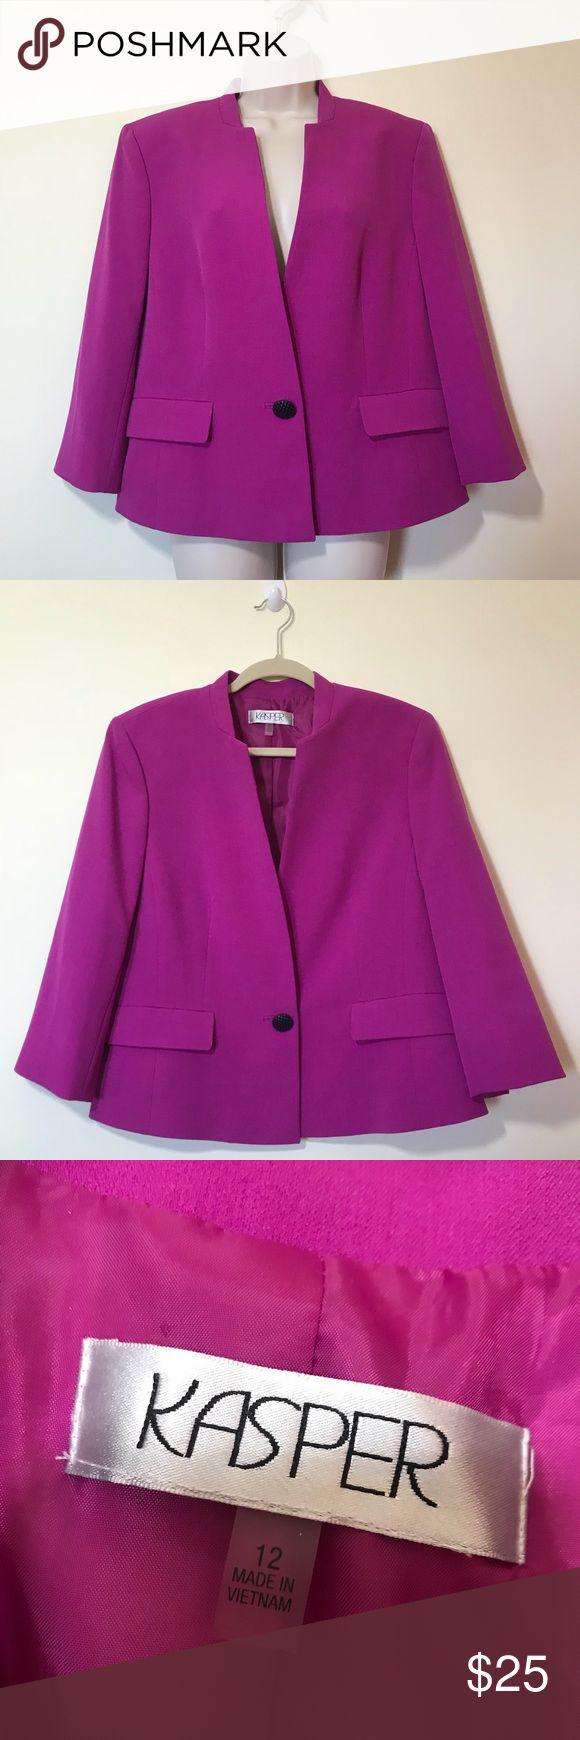 Purple Kasper Blazer Purple blazer from Kasper. Size 12! Fits true to size. 3/4 quarter length sleeve. One single black button. Worn twice — no stains/holes. Price is not firm — make an offer! 🖤 Kasper Jackets & Coats Blazers